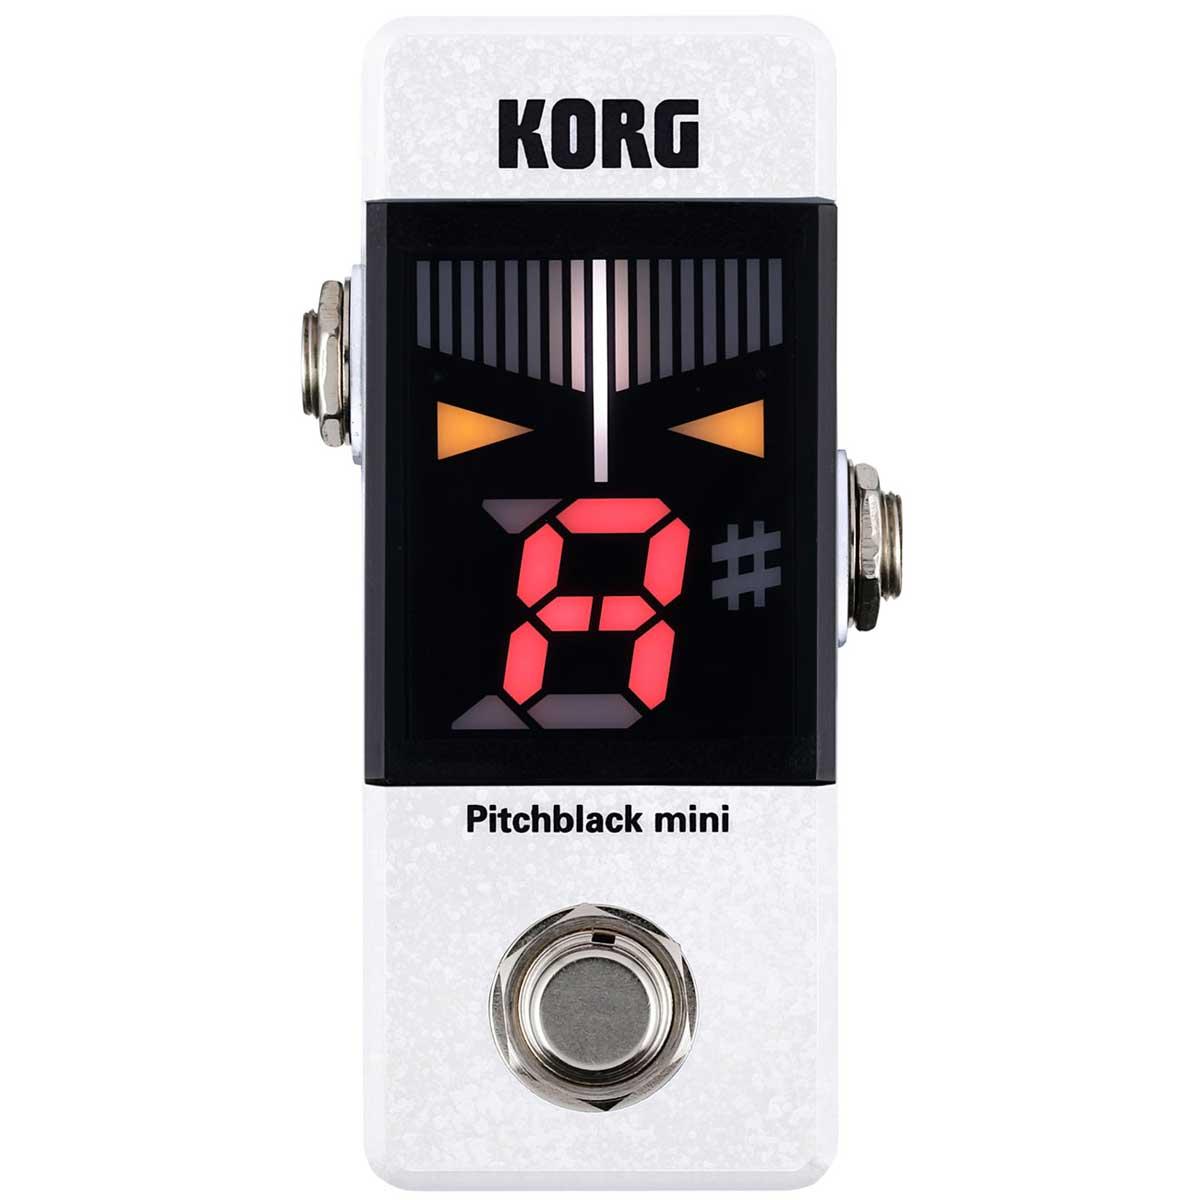 KORG コルグ / Pitchblack mini White PEDAL TUNER ピッチブラック ミニ ペダルチューナー【WEBSHOP】【YRK】